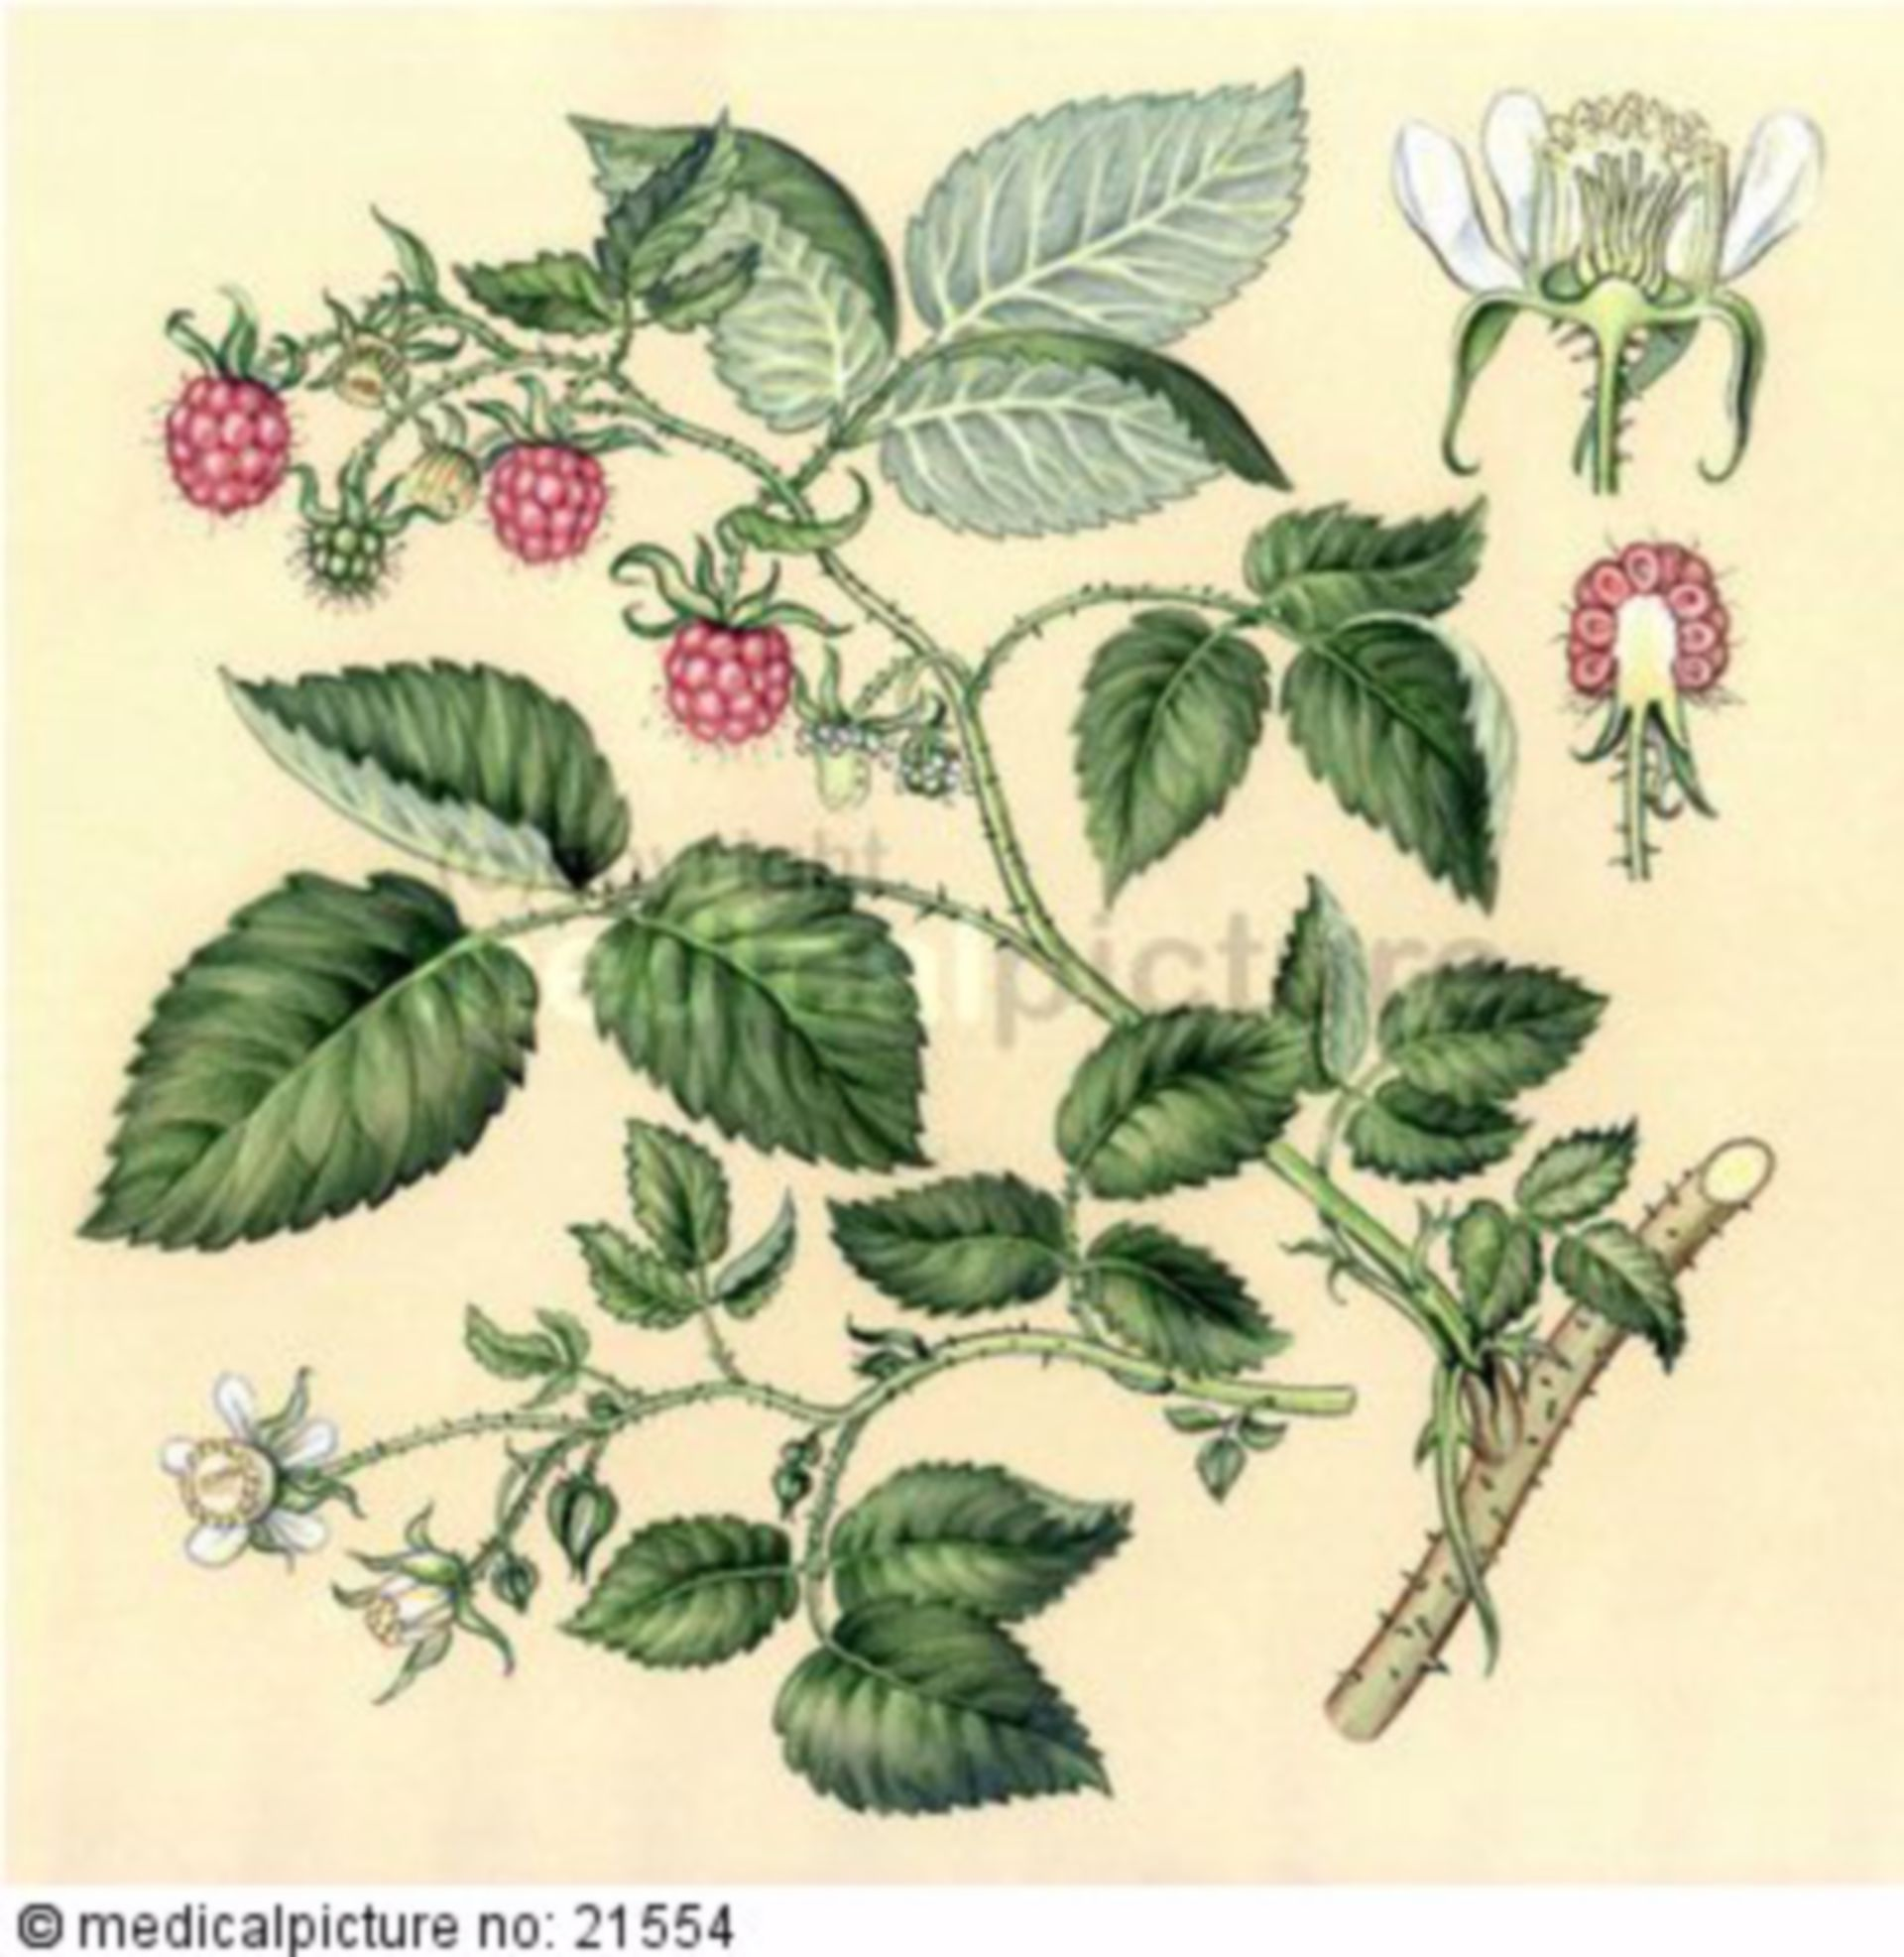 Himbeere, Rubus idaeus